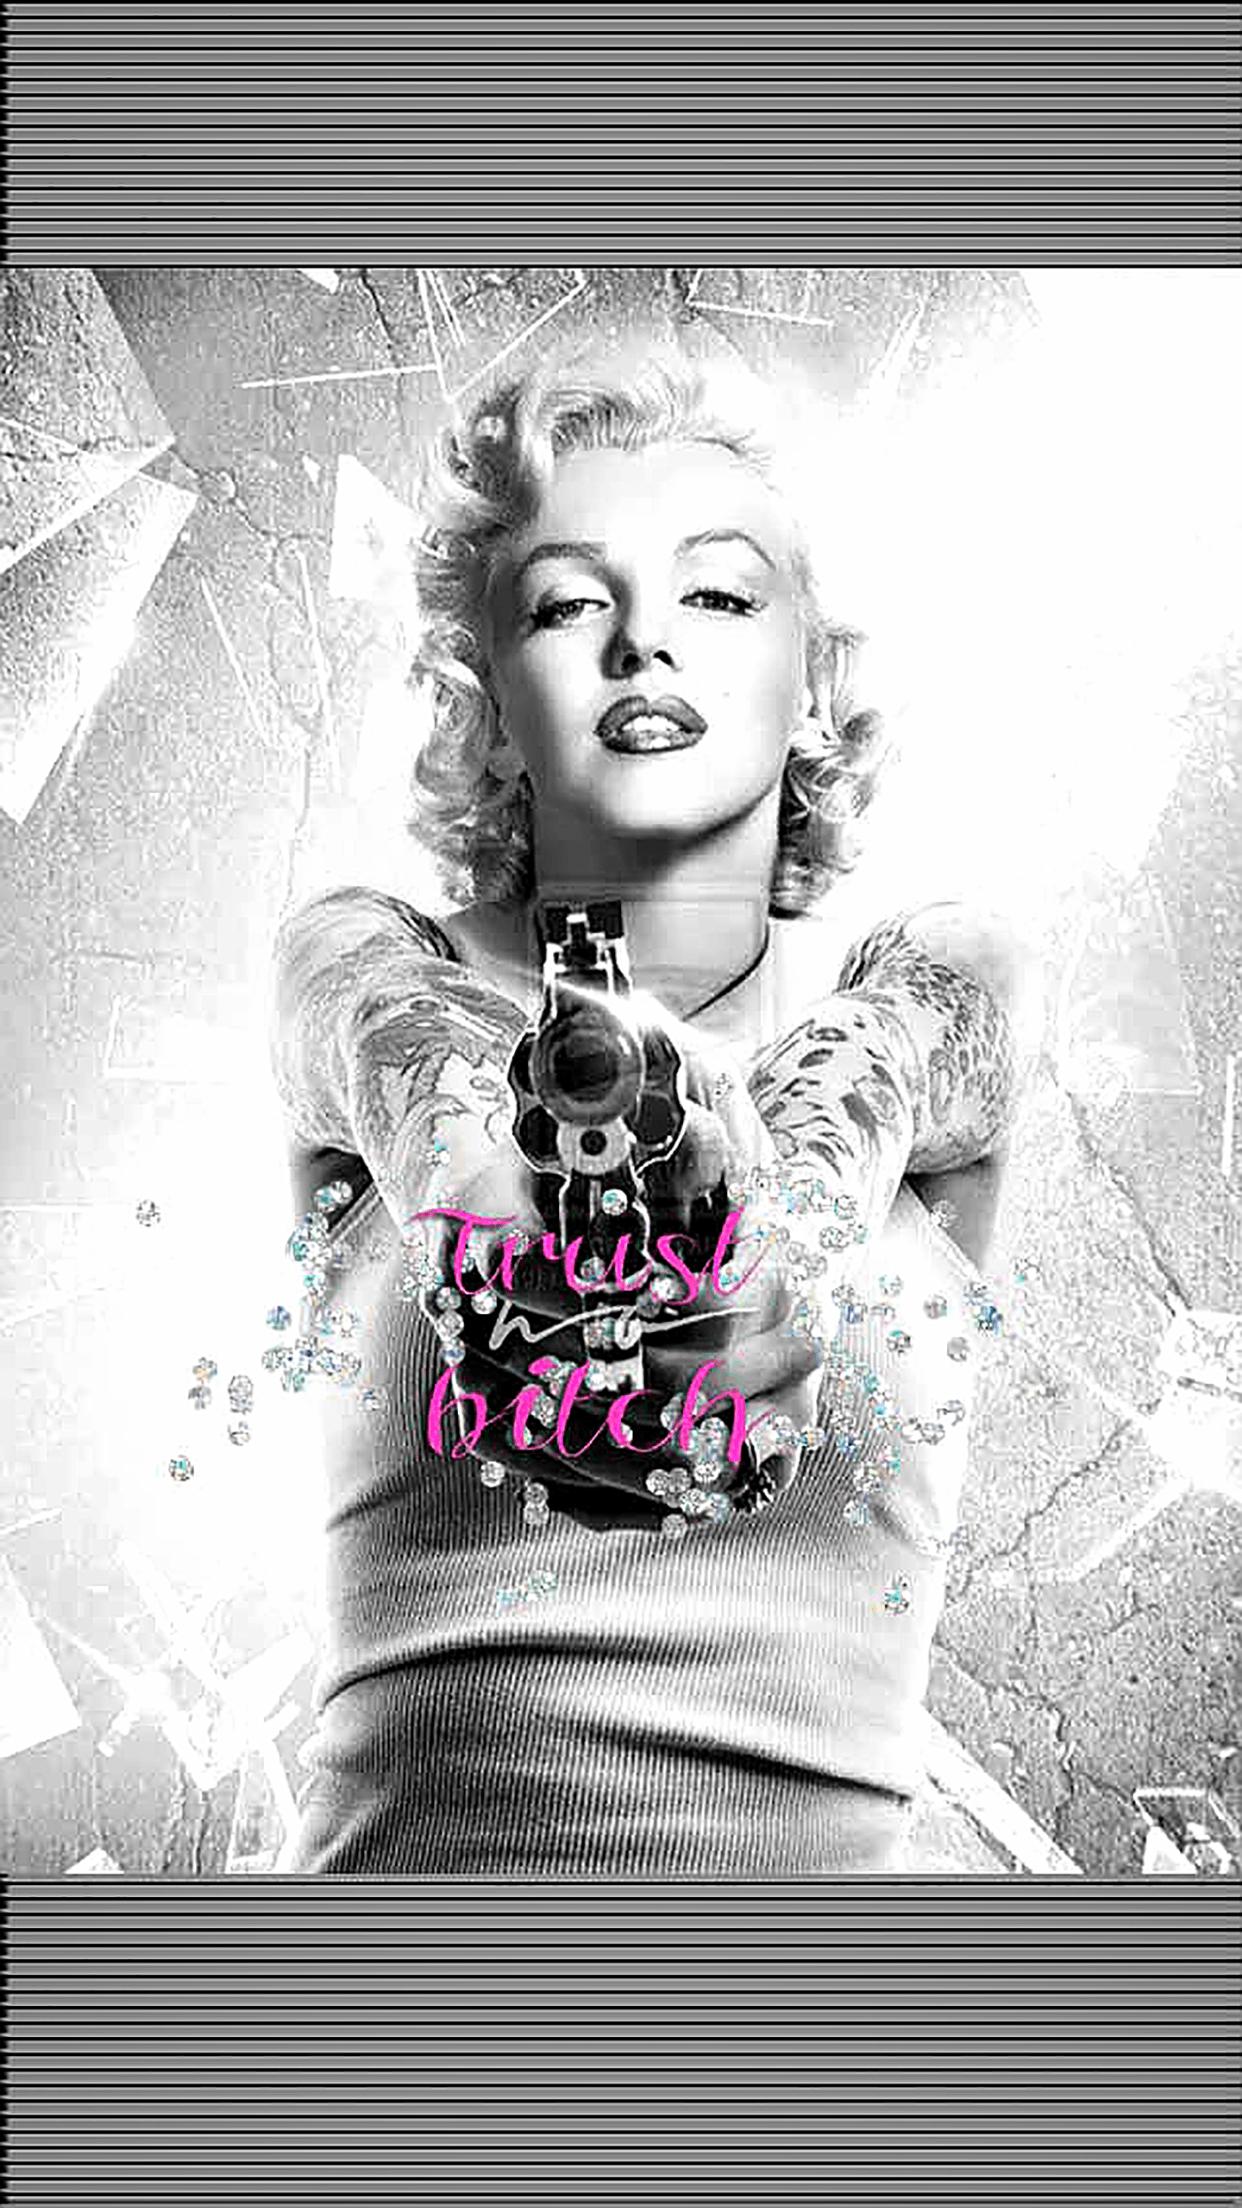 Marilyn Monroe Artistic Wallpapers - Wallpaper Cave